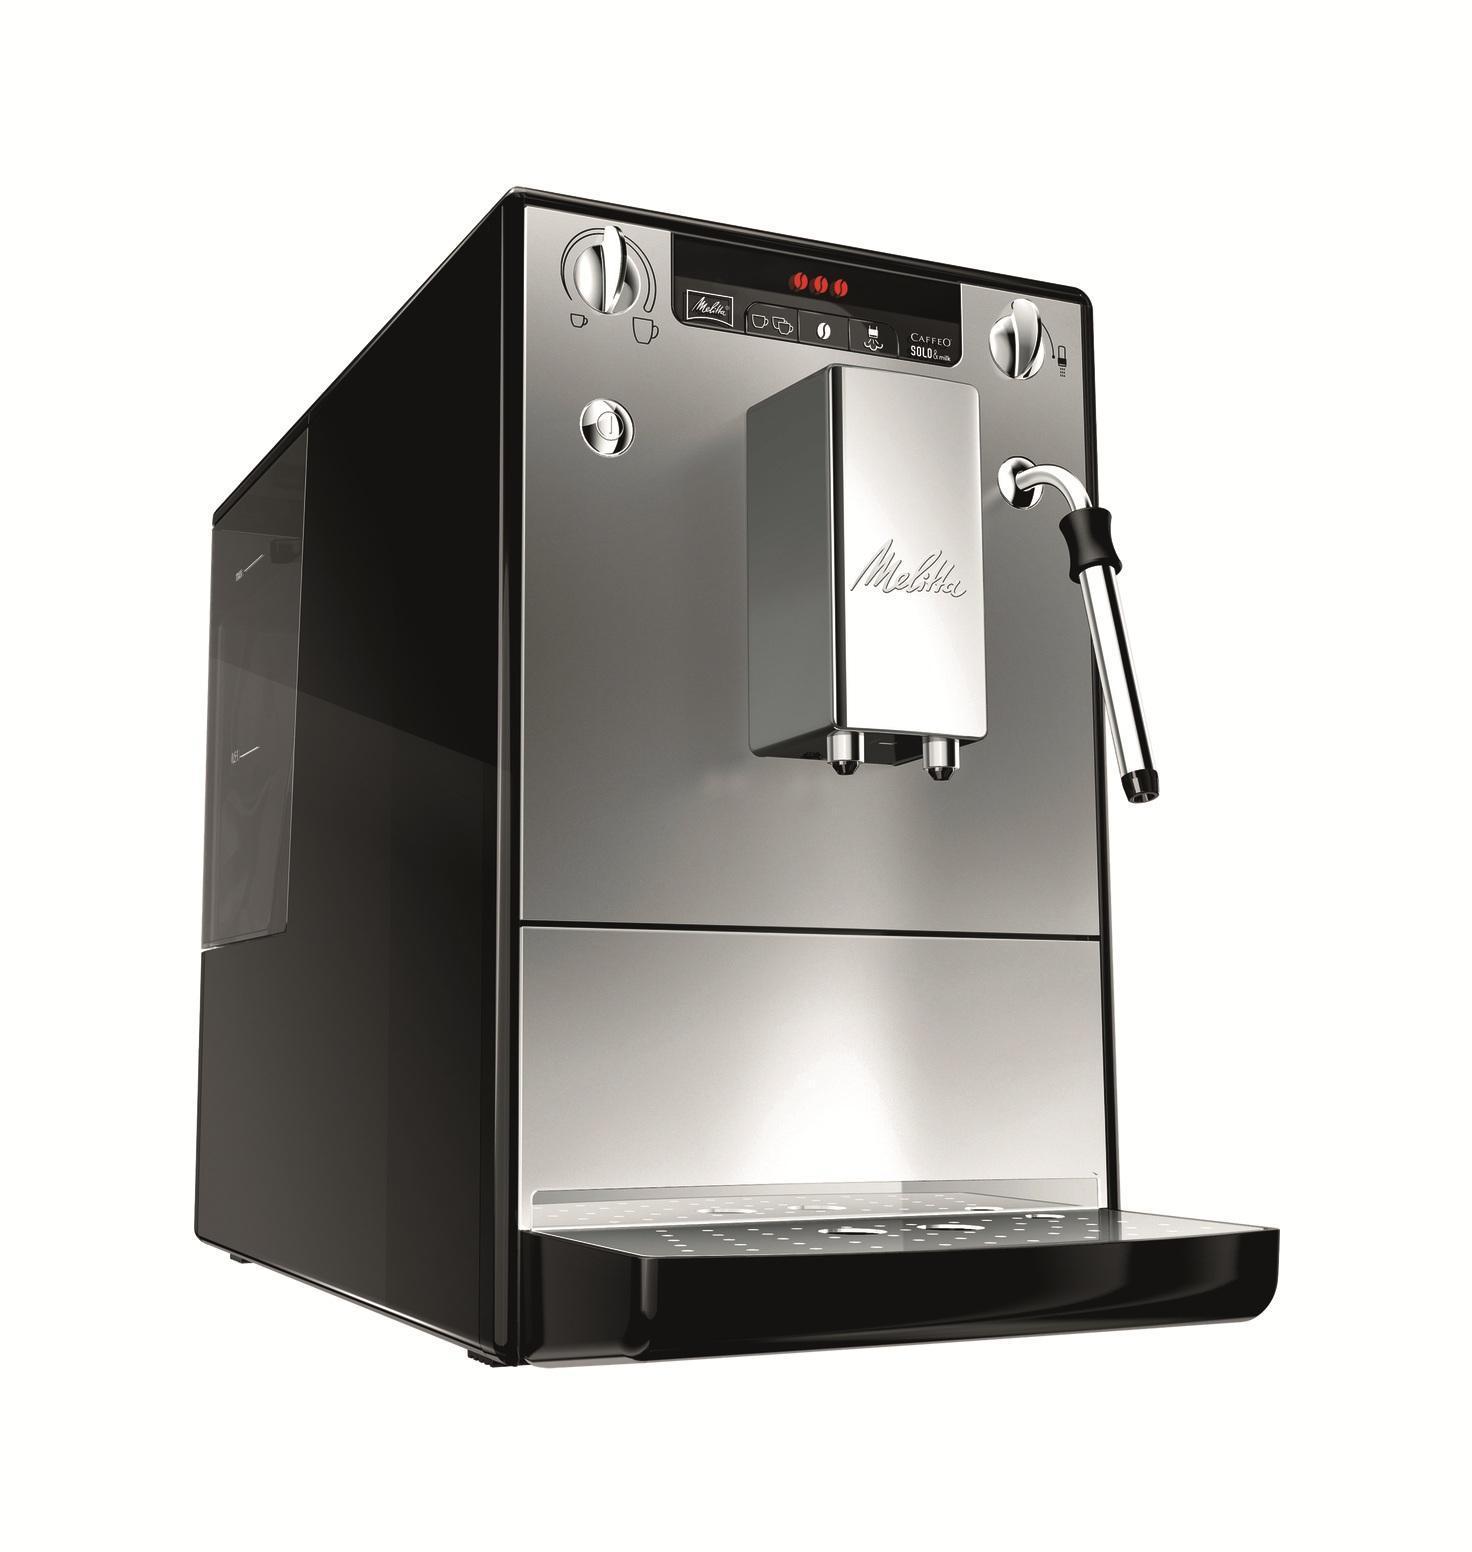 Melitta Caffeo Solo&milk E953-102, Silver Black кофемашина кофемашина melitta caffeo varianza csp f 570 102 черный